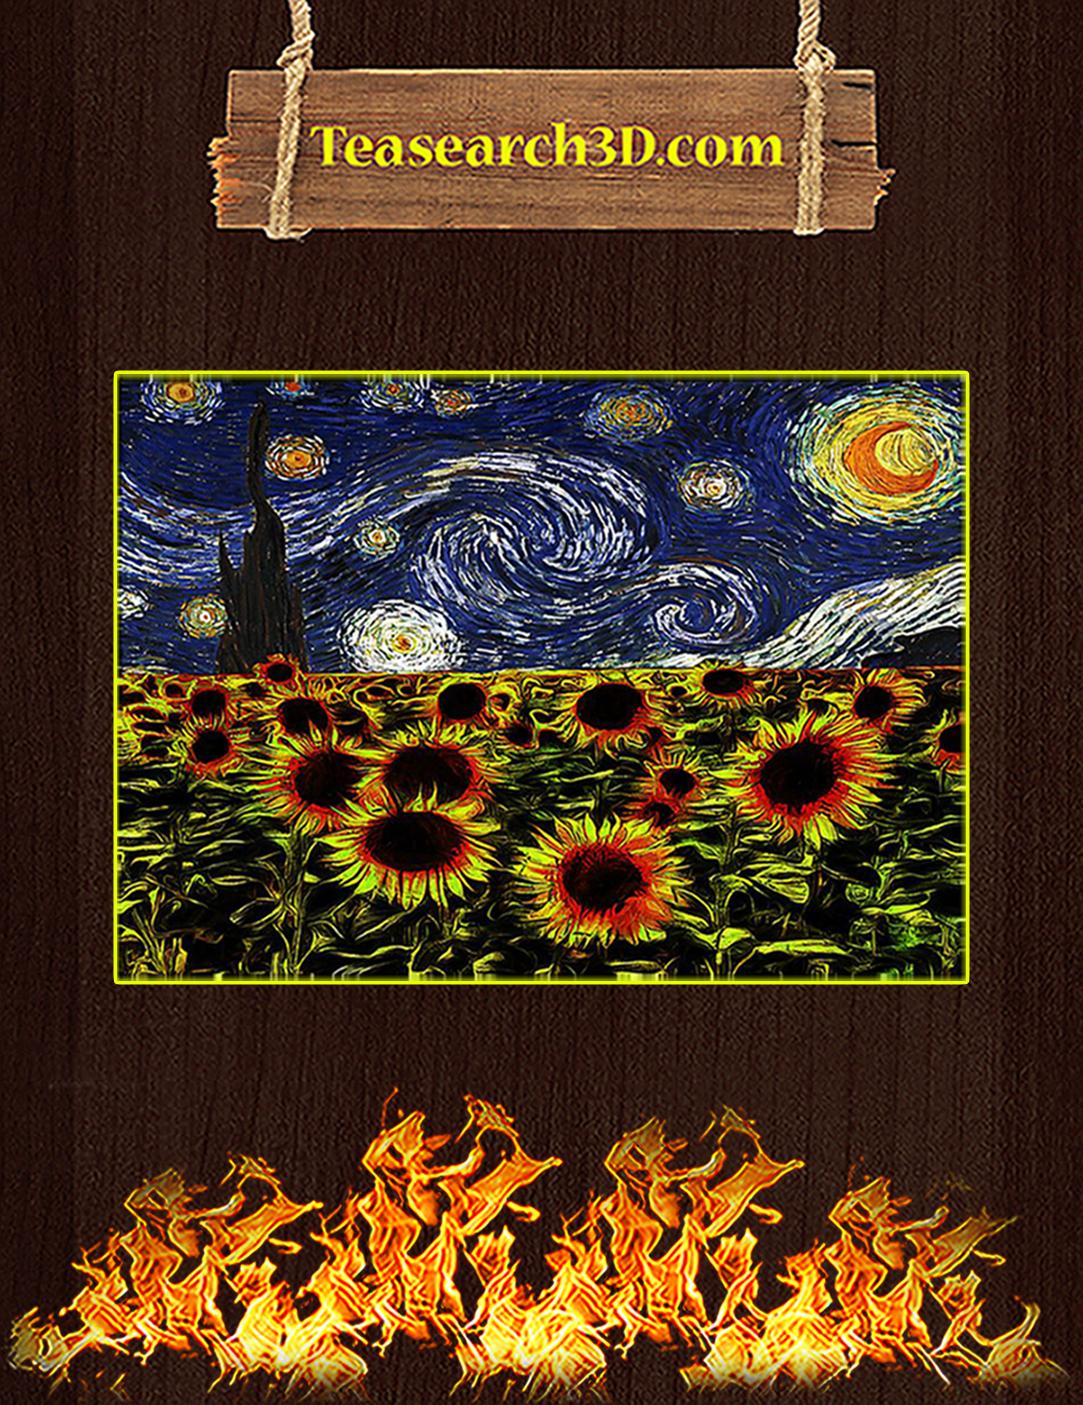 Sunflowers starry night van gogh poster A2